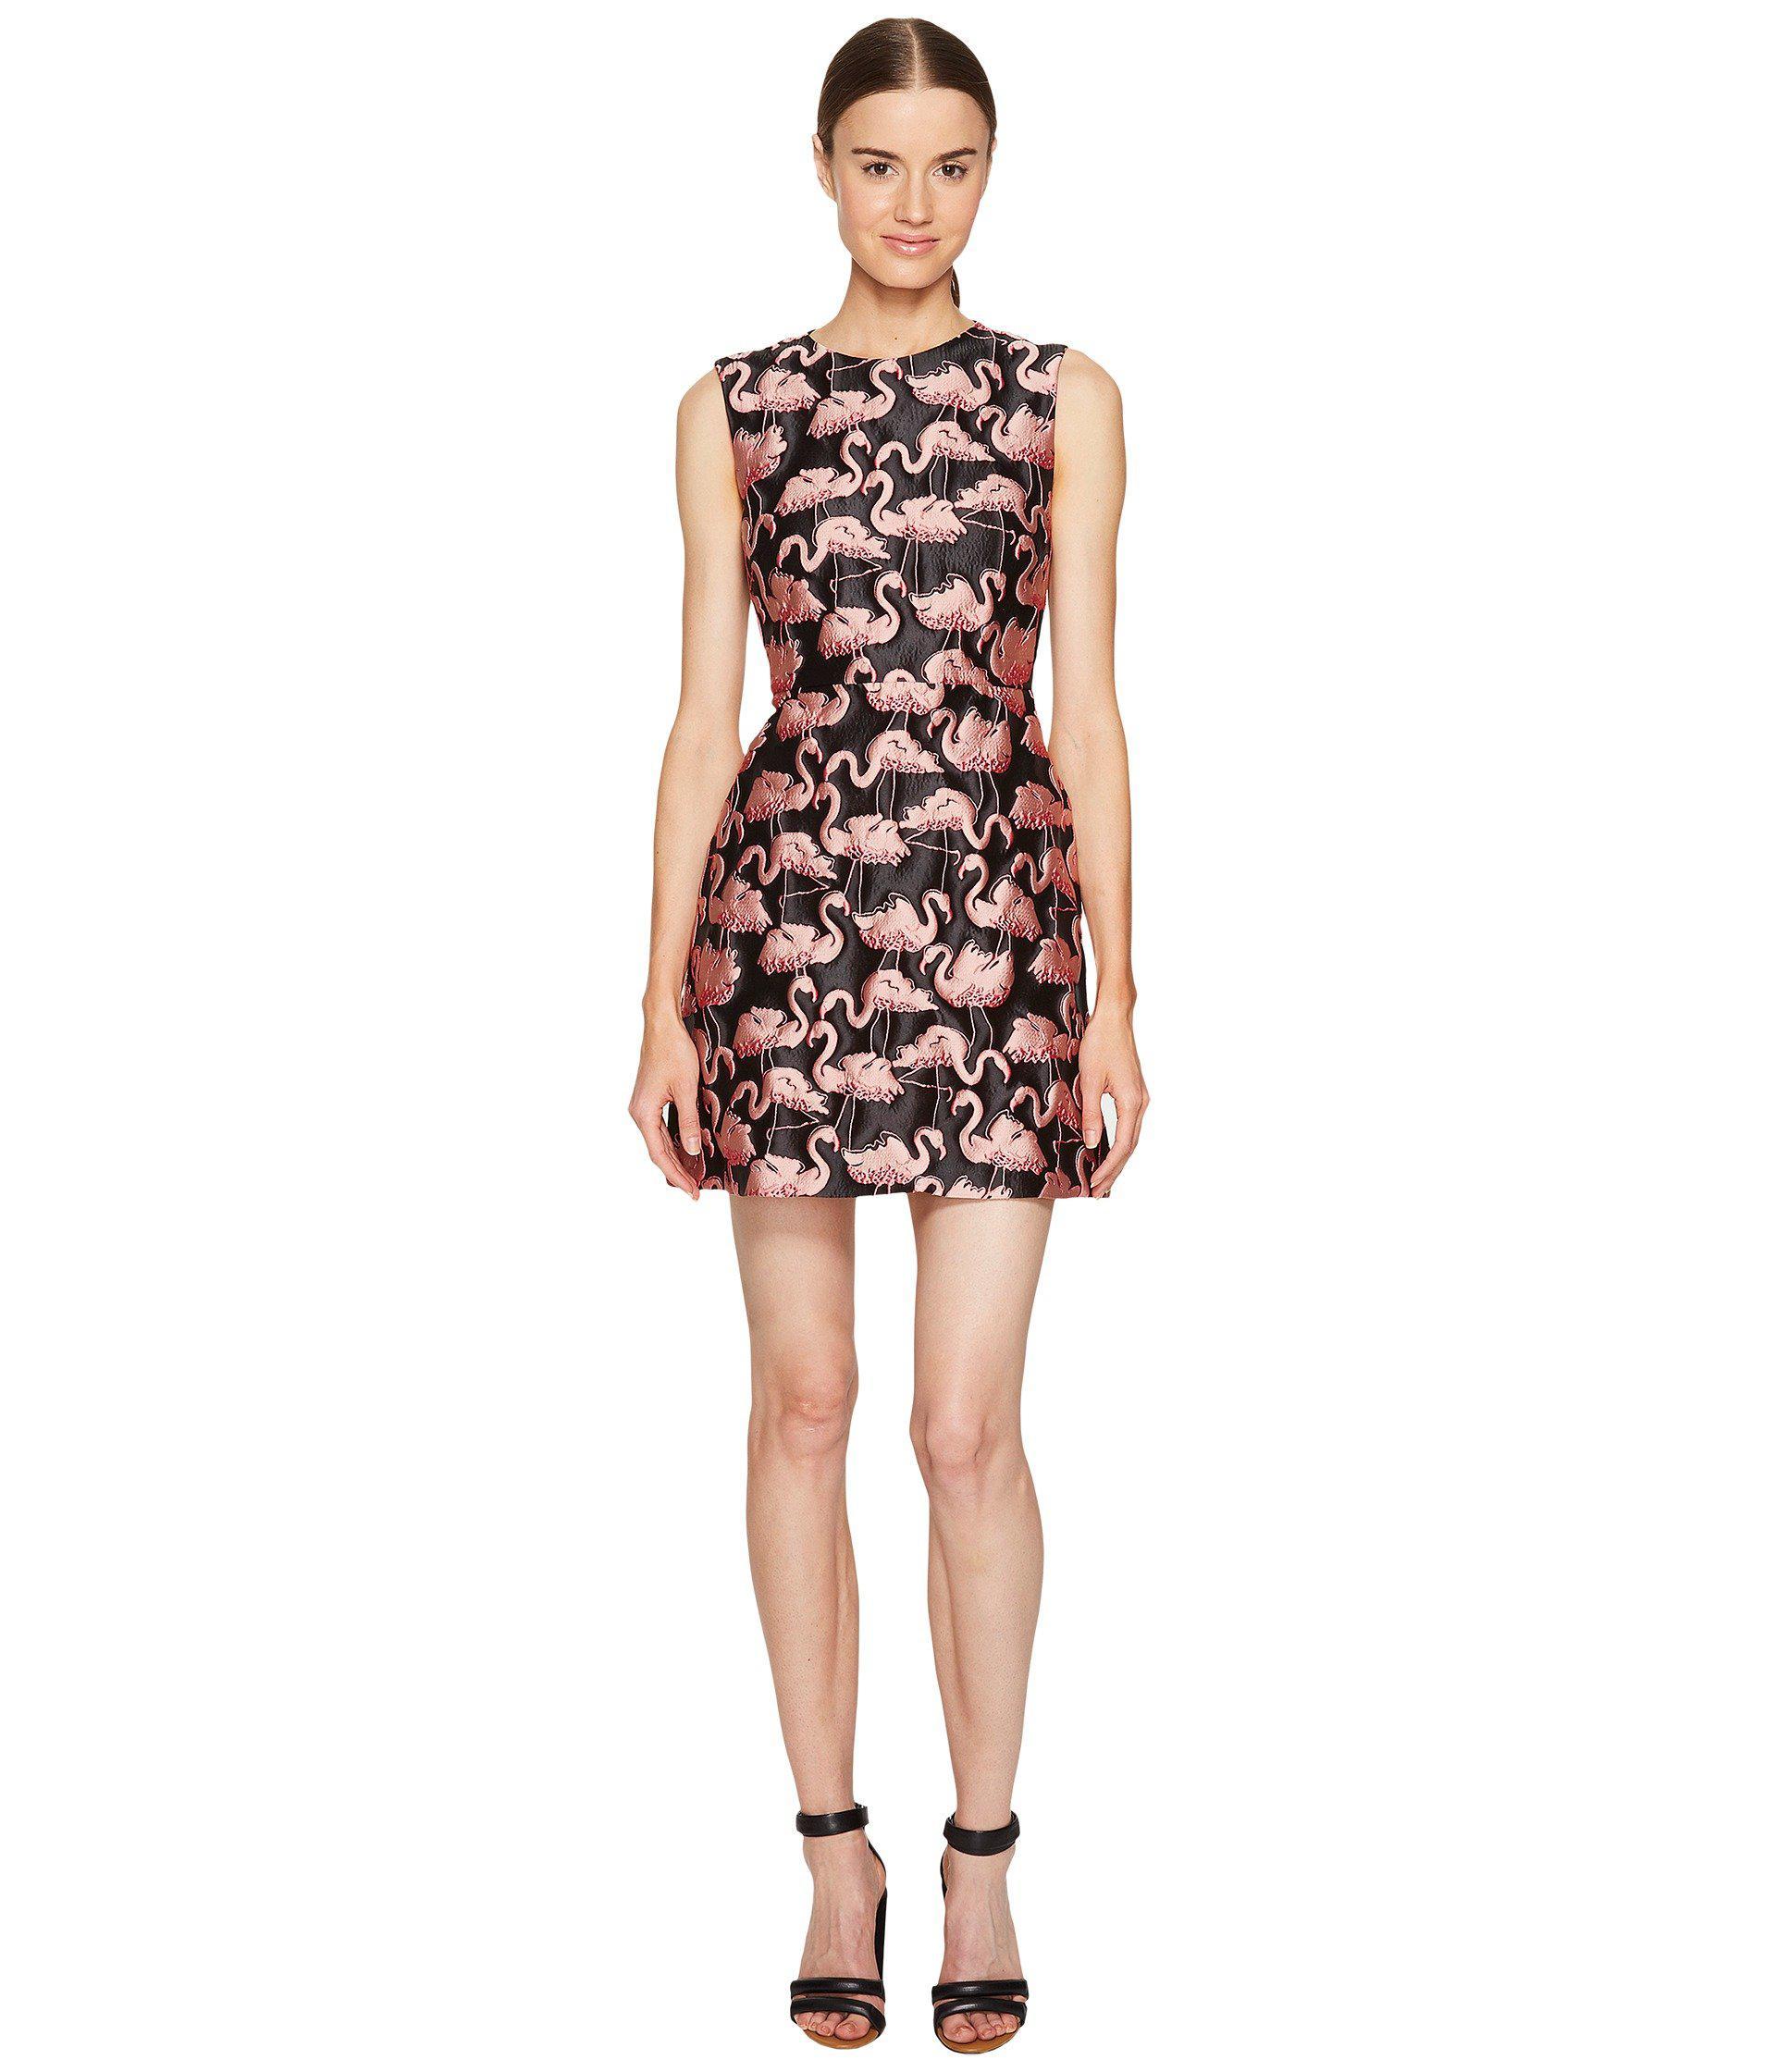 6Pm Cocktail Dresses